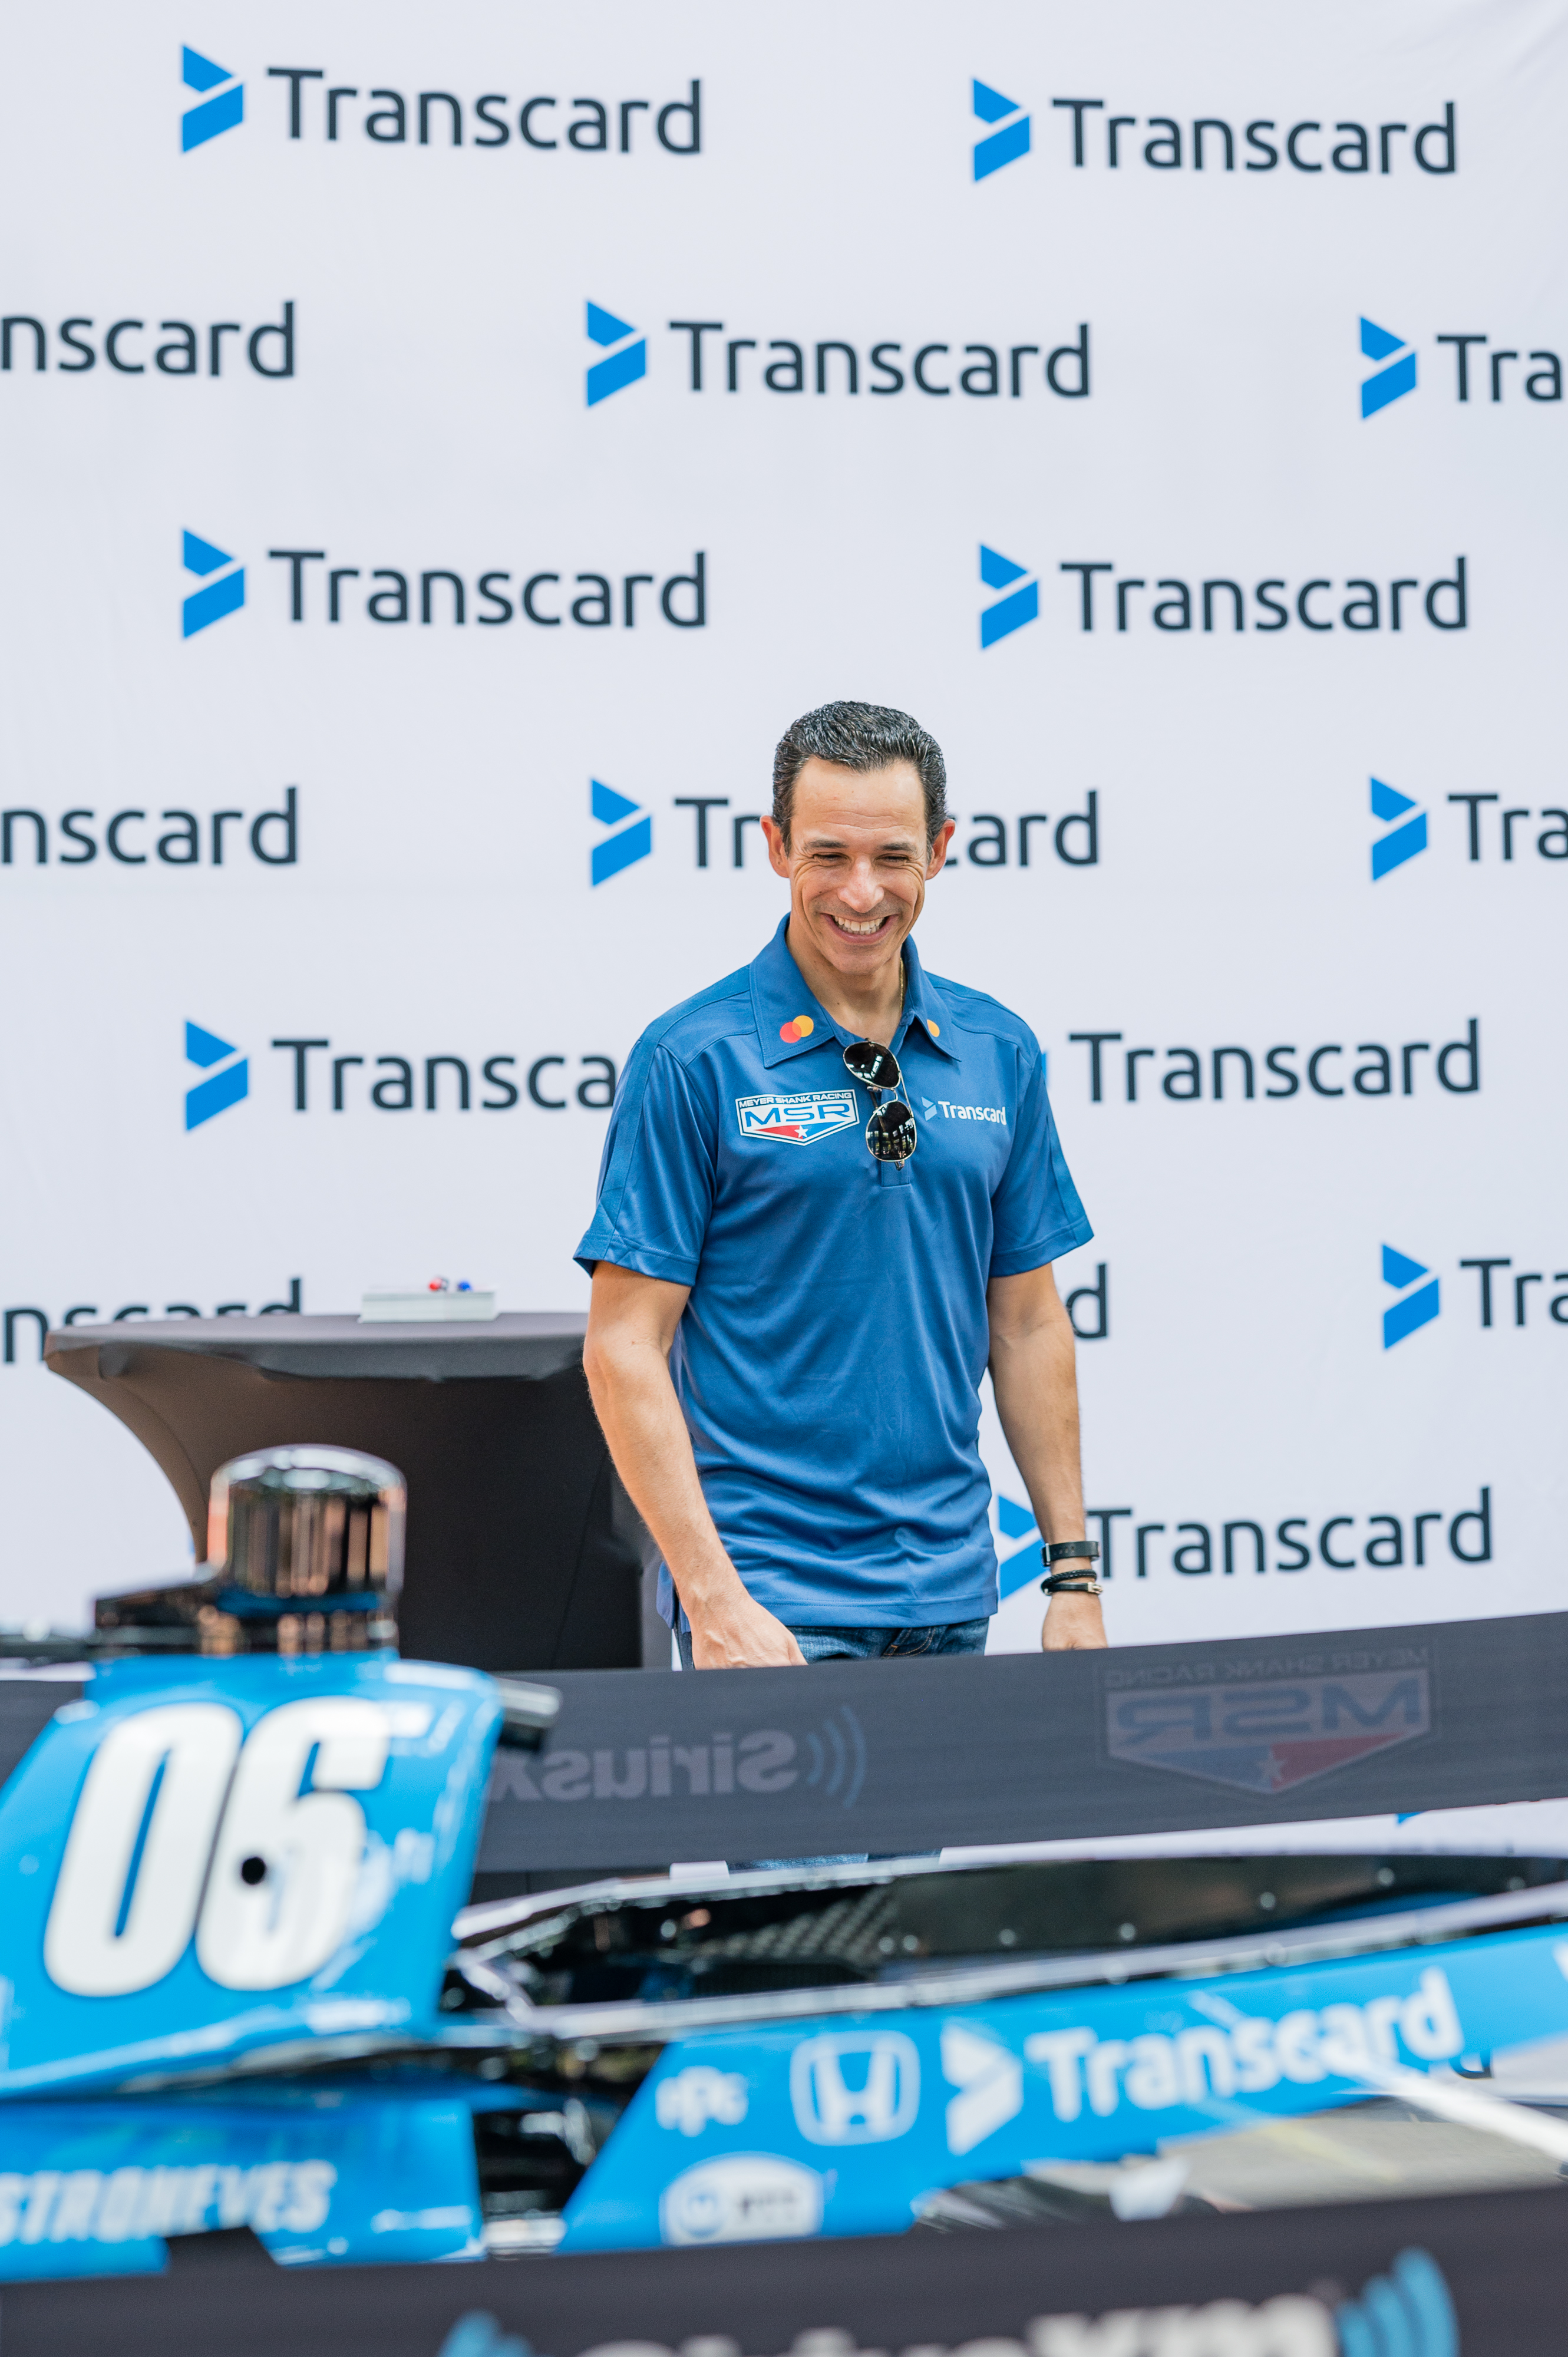 transcard-car-reveal-25